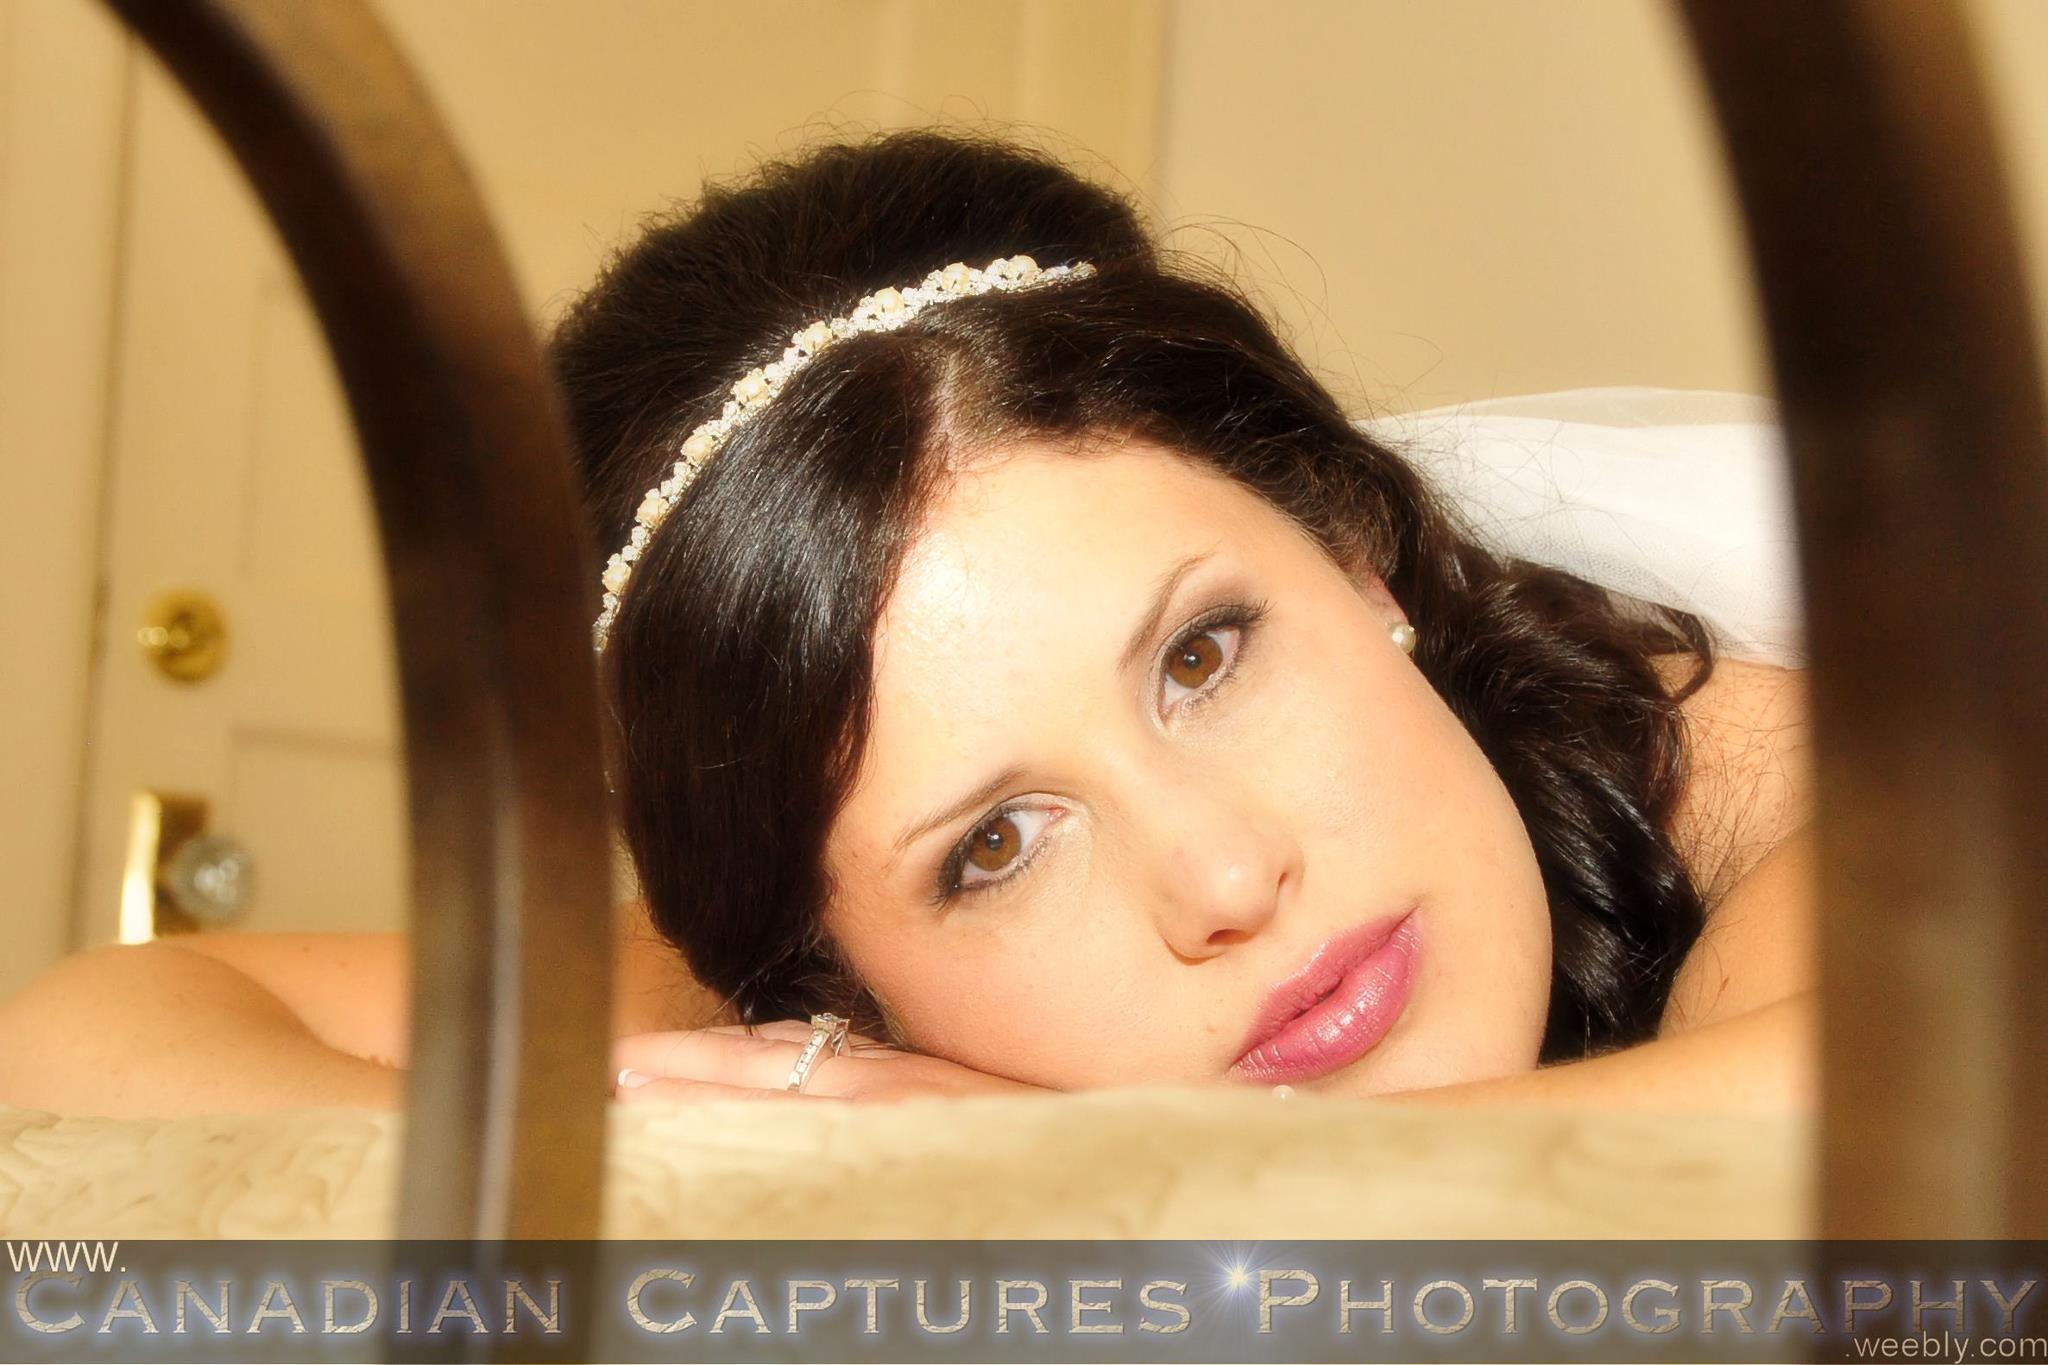 Keupbynatalielazzarin makeup by natalie lazzarin